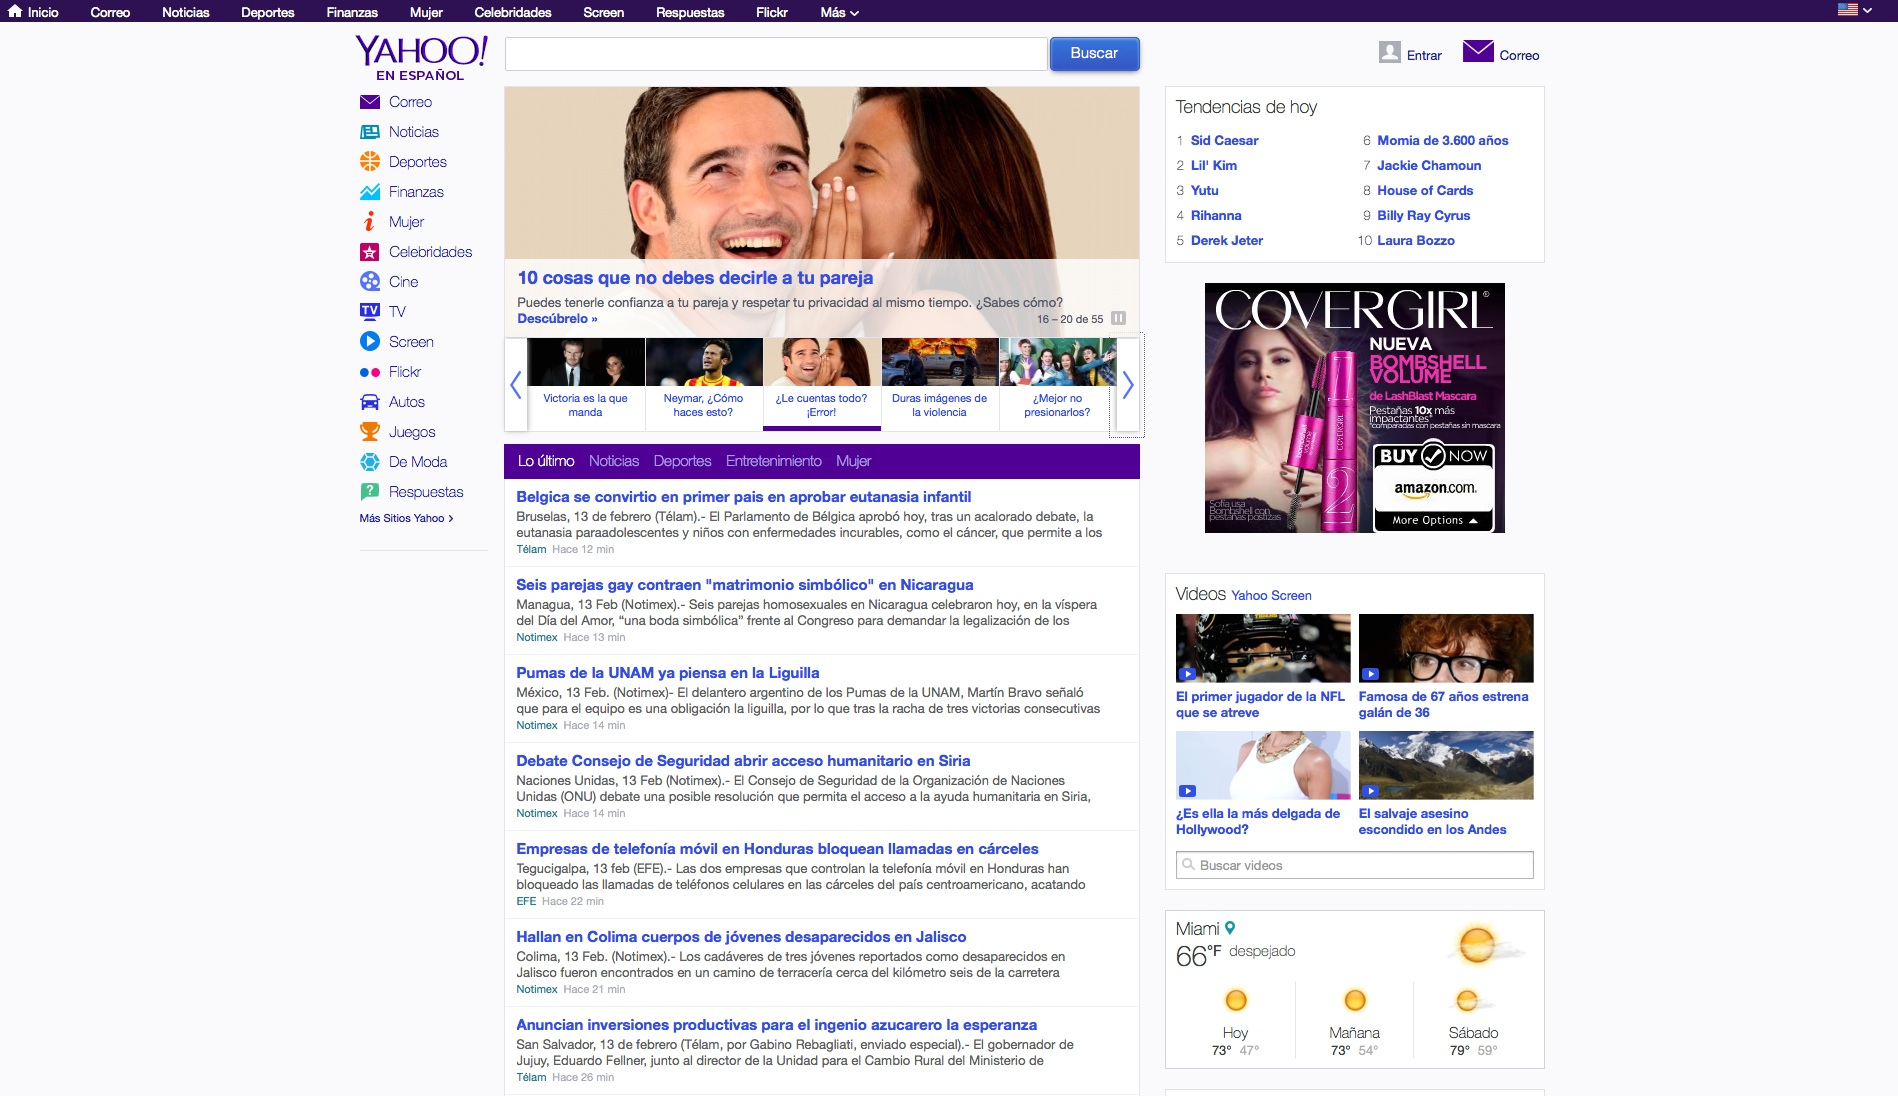 Yahoo! en Español: The new and improved Yahoo in Spanish